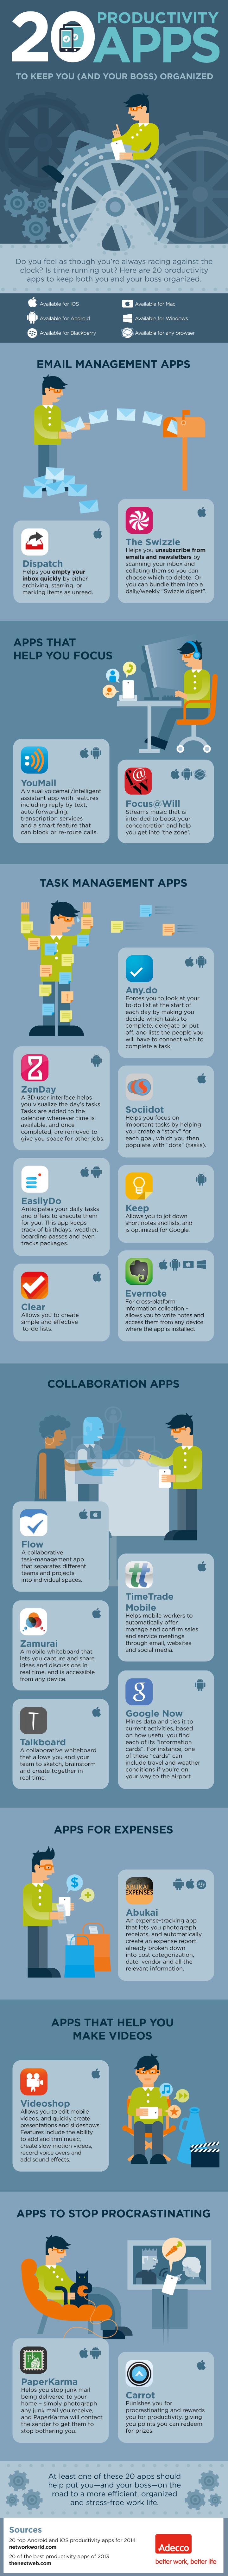 TechBlogcorner-20-mobileapps-productivity